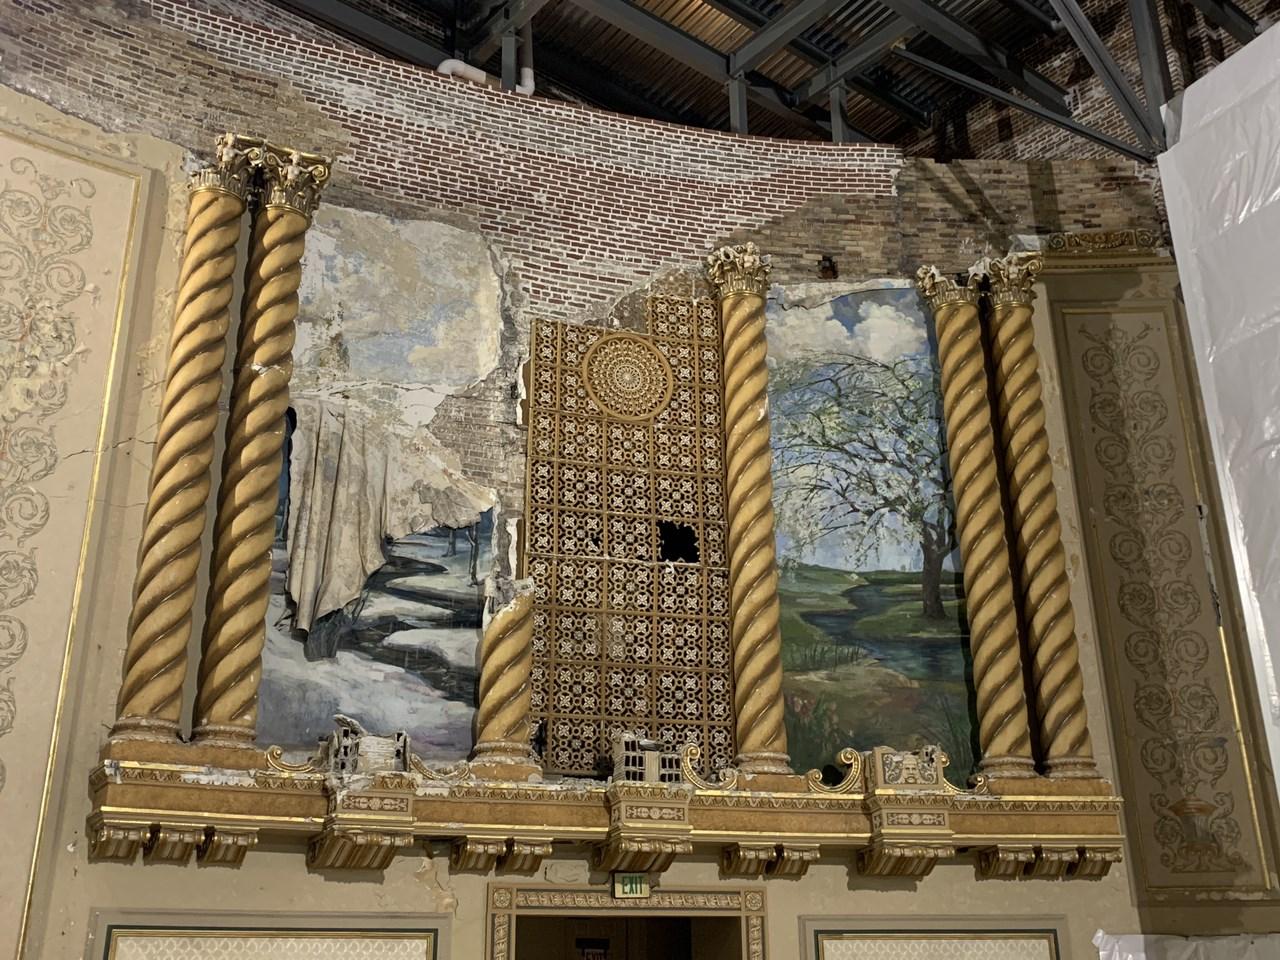 Damaged theater artwork